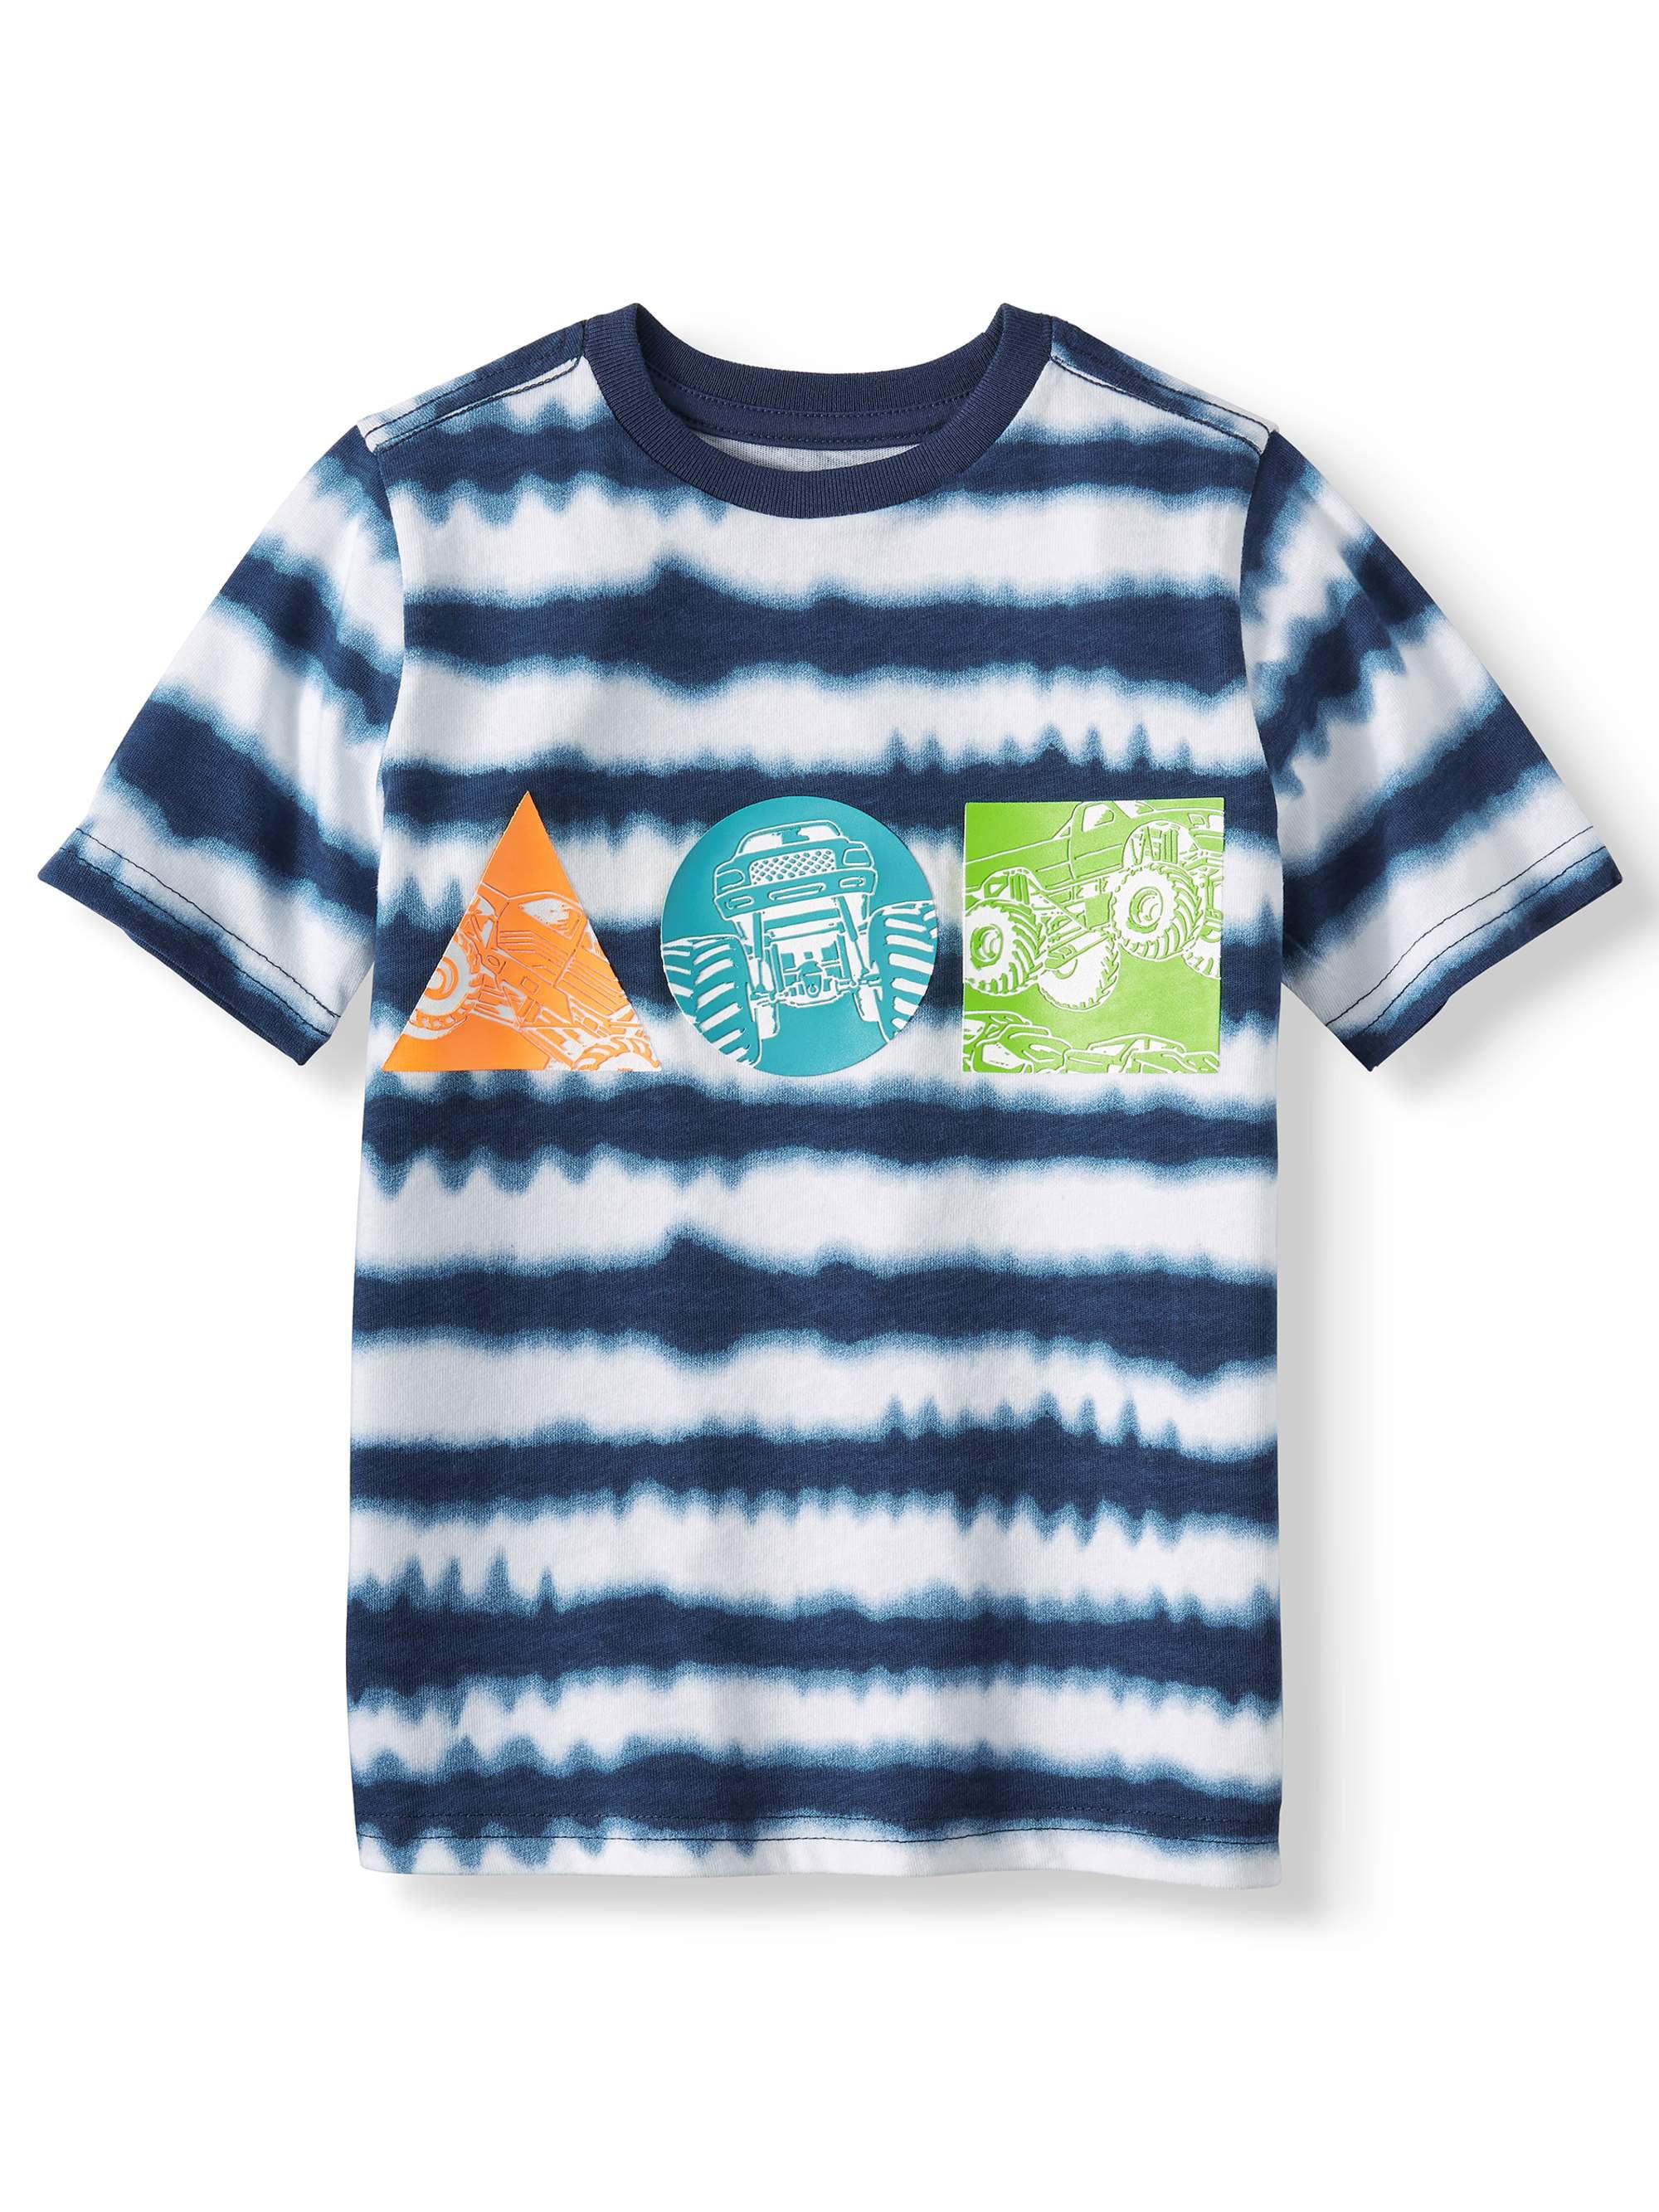 Short Sleeve Tie Dye Graphic Tee (Little Boys & Big Boys)